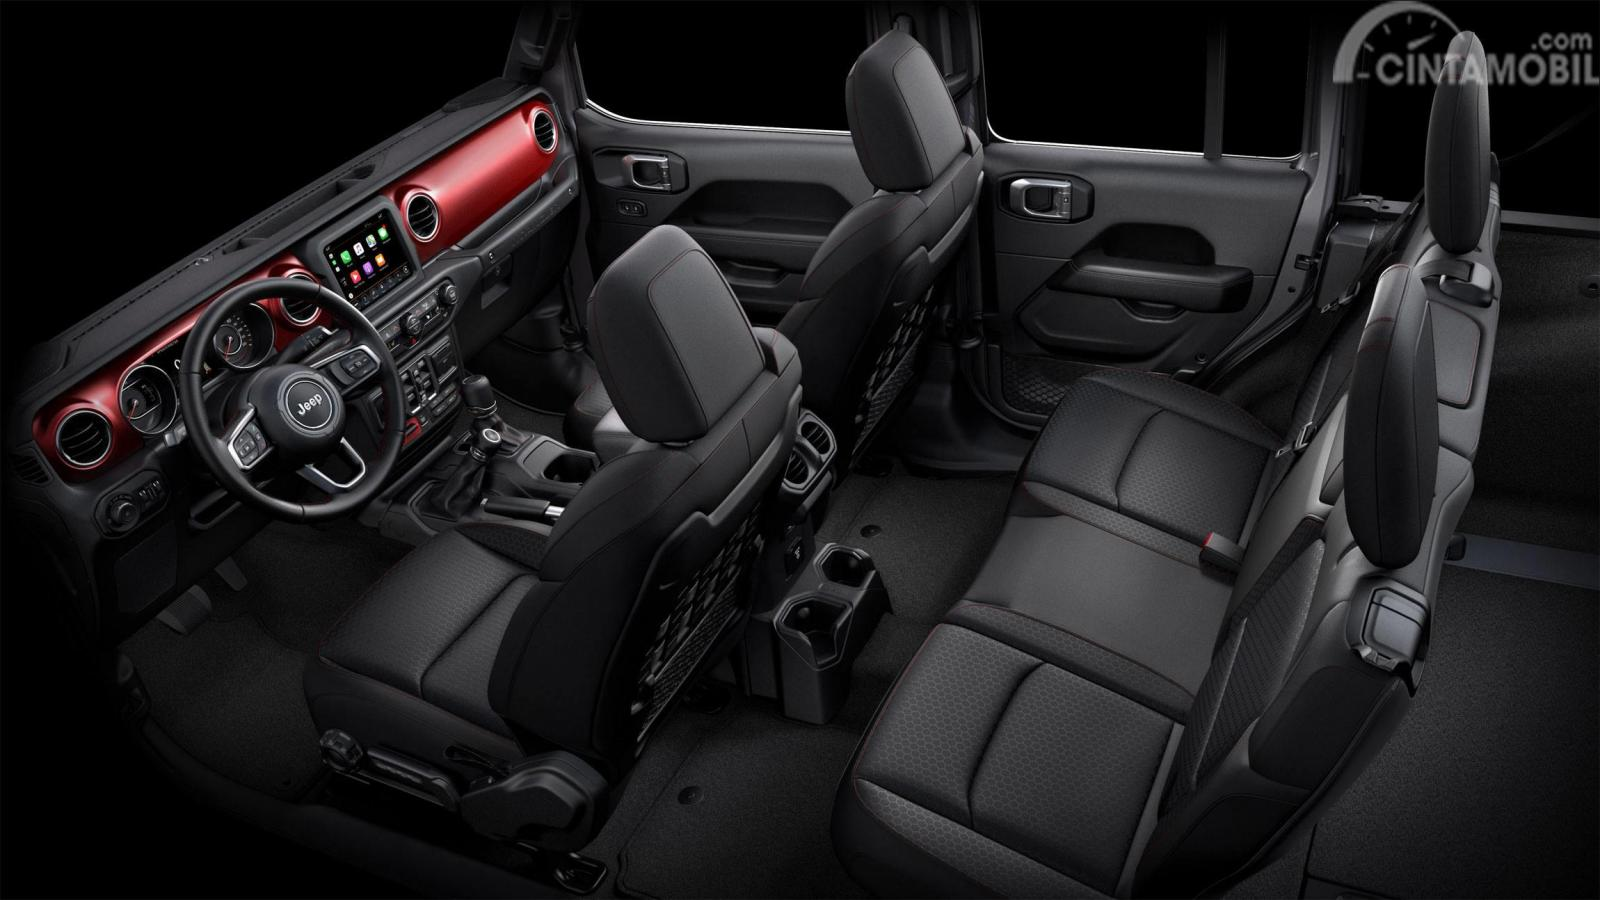 Review Jeep Wrangler Rubicon 4 Door 2019